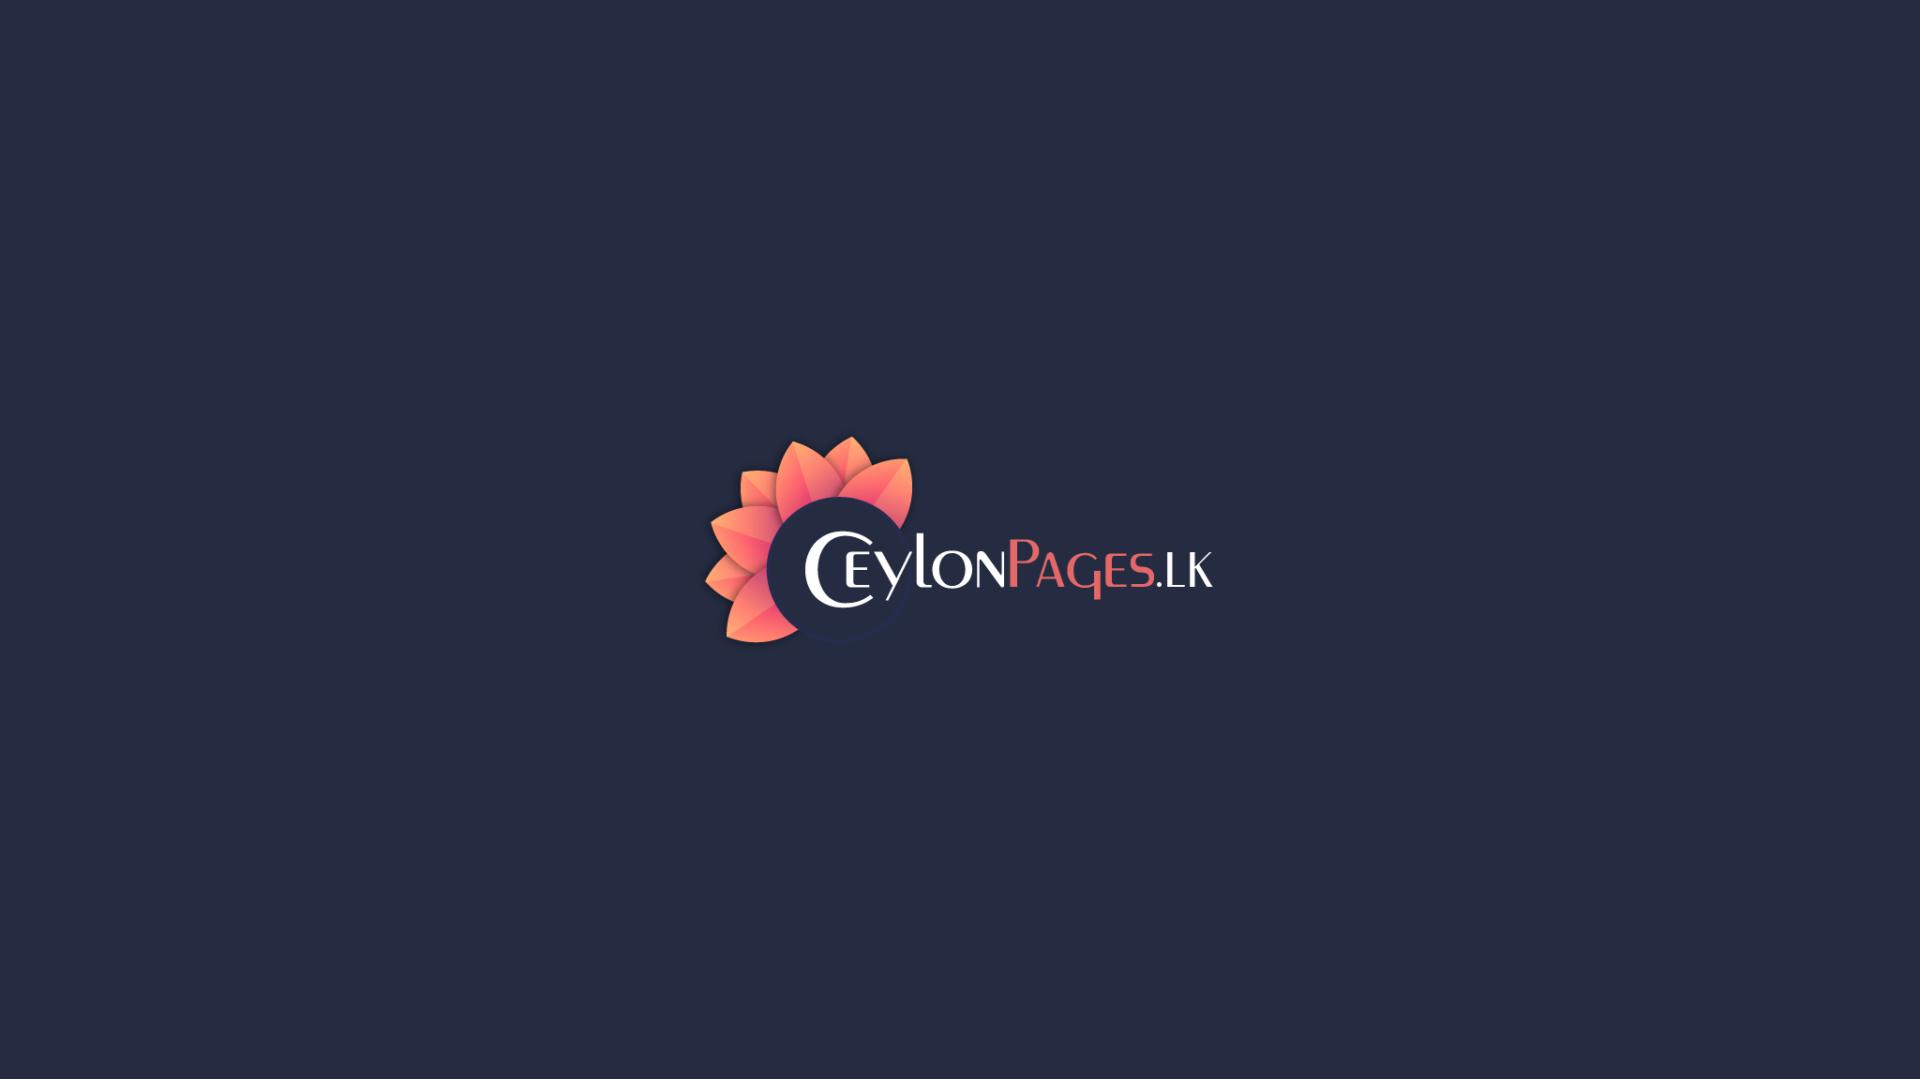 Ceylon Pages LK